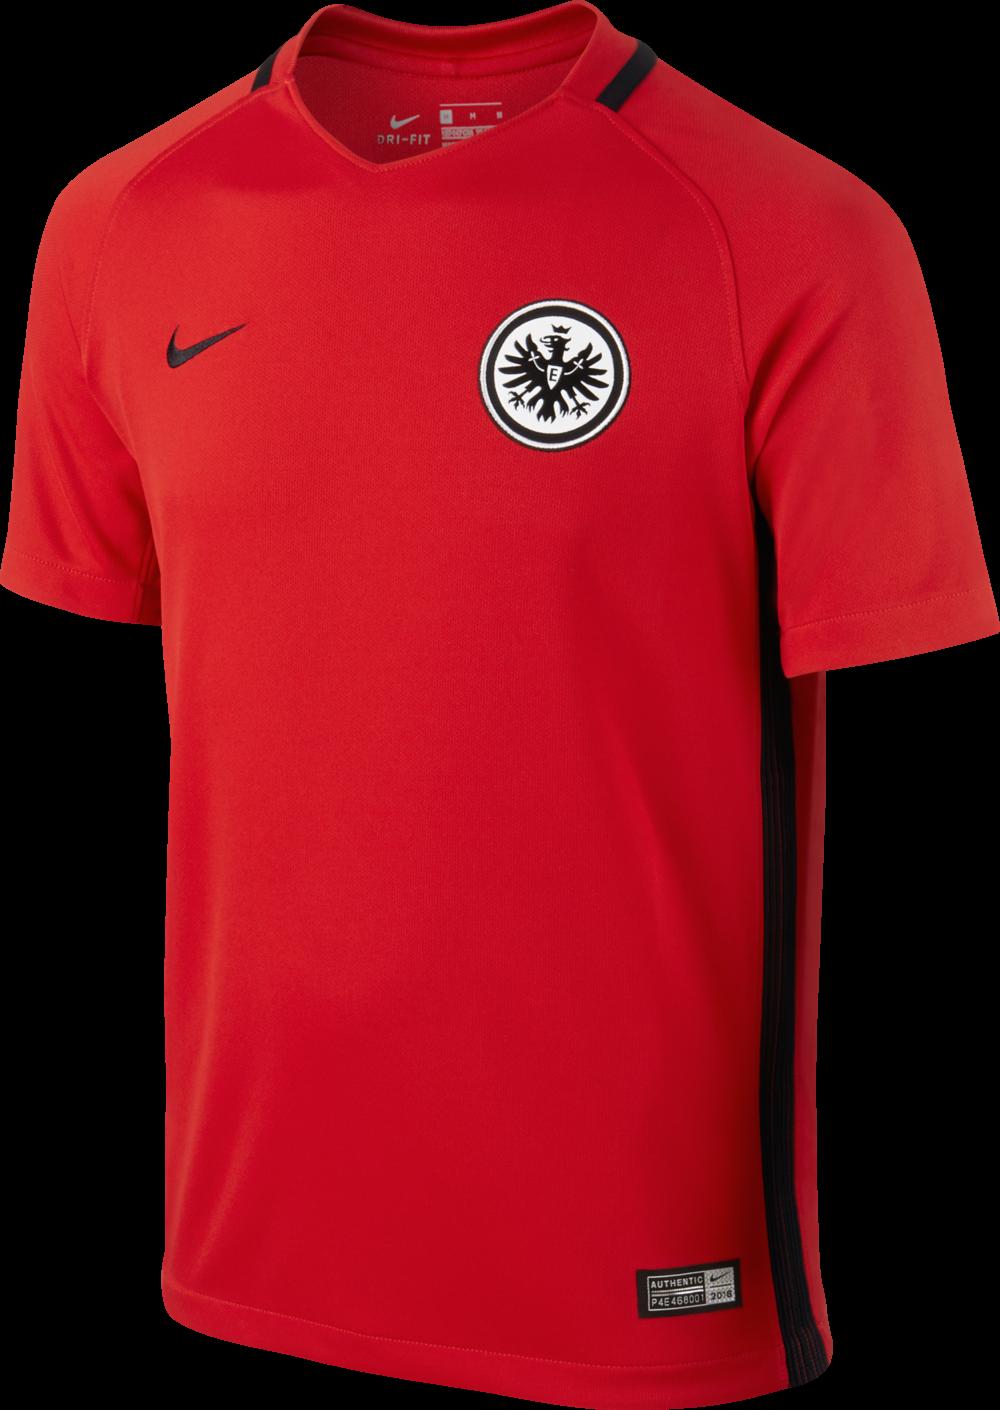 Nike Eintracht Frankfurt Away Trikot Kinder 20162017 Rot 808578